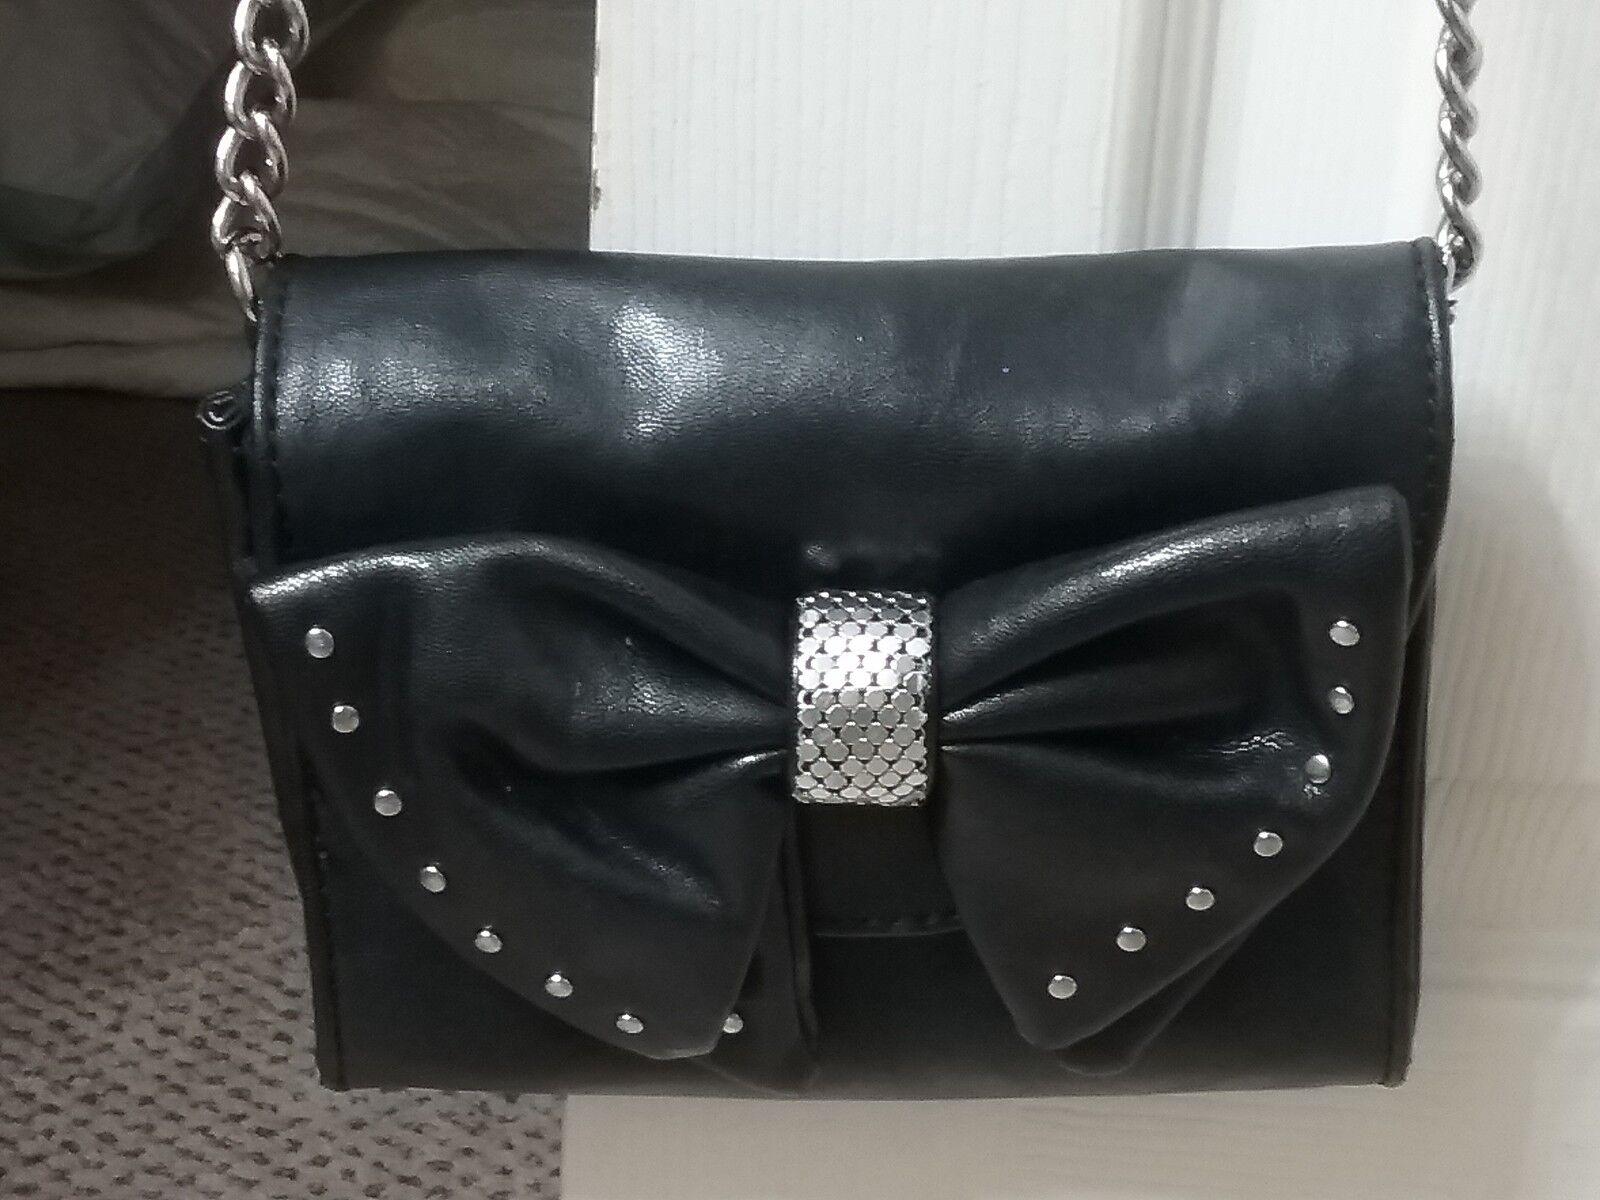 Women's Handbag & Accessory Gallery